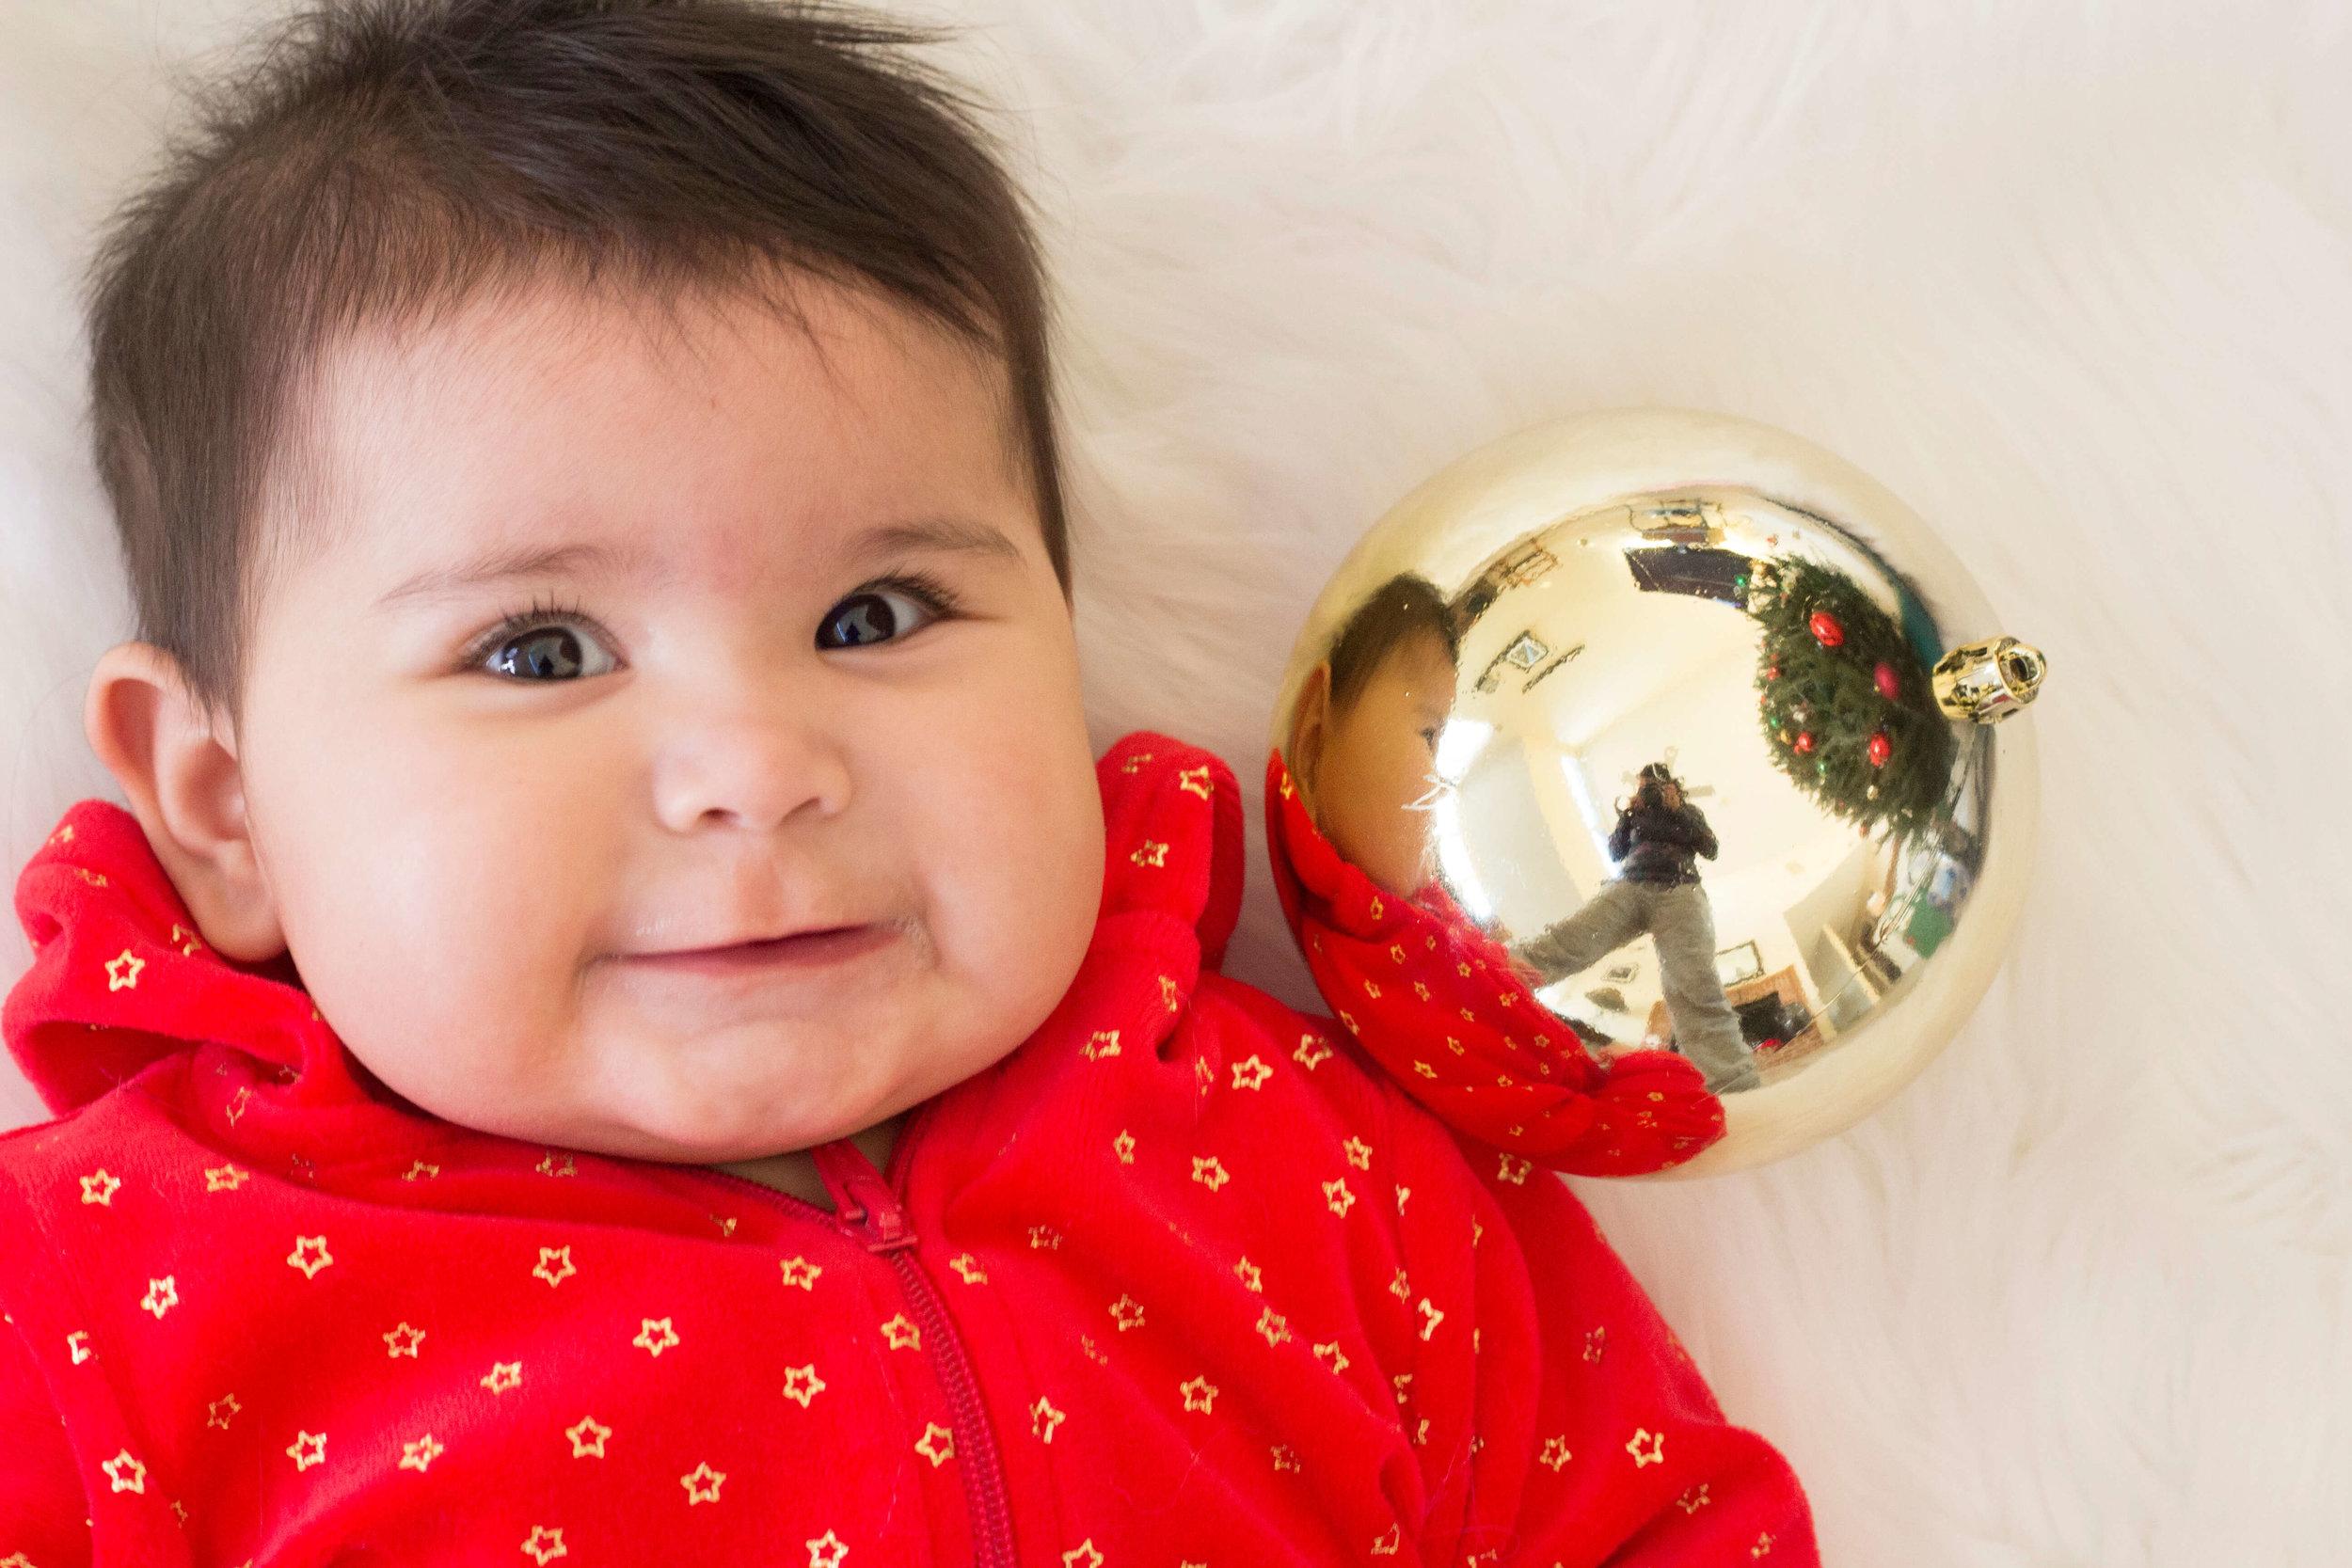 Baby Christmas photo ideas